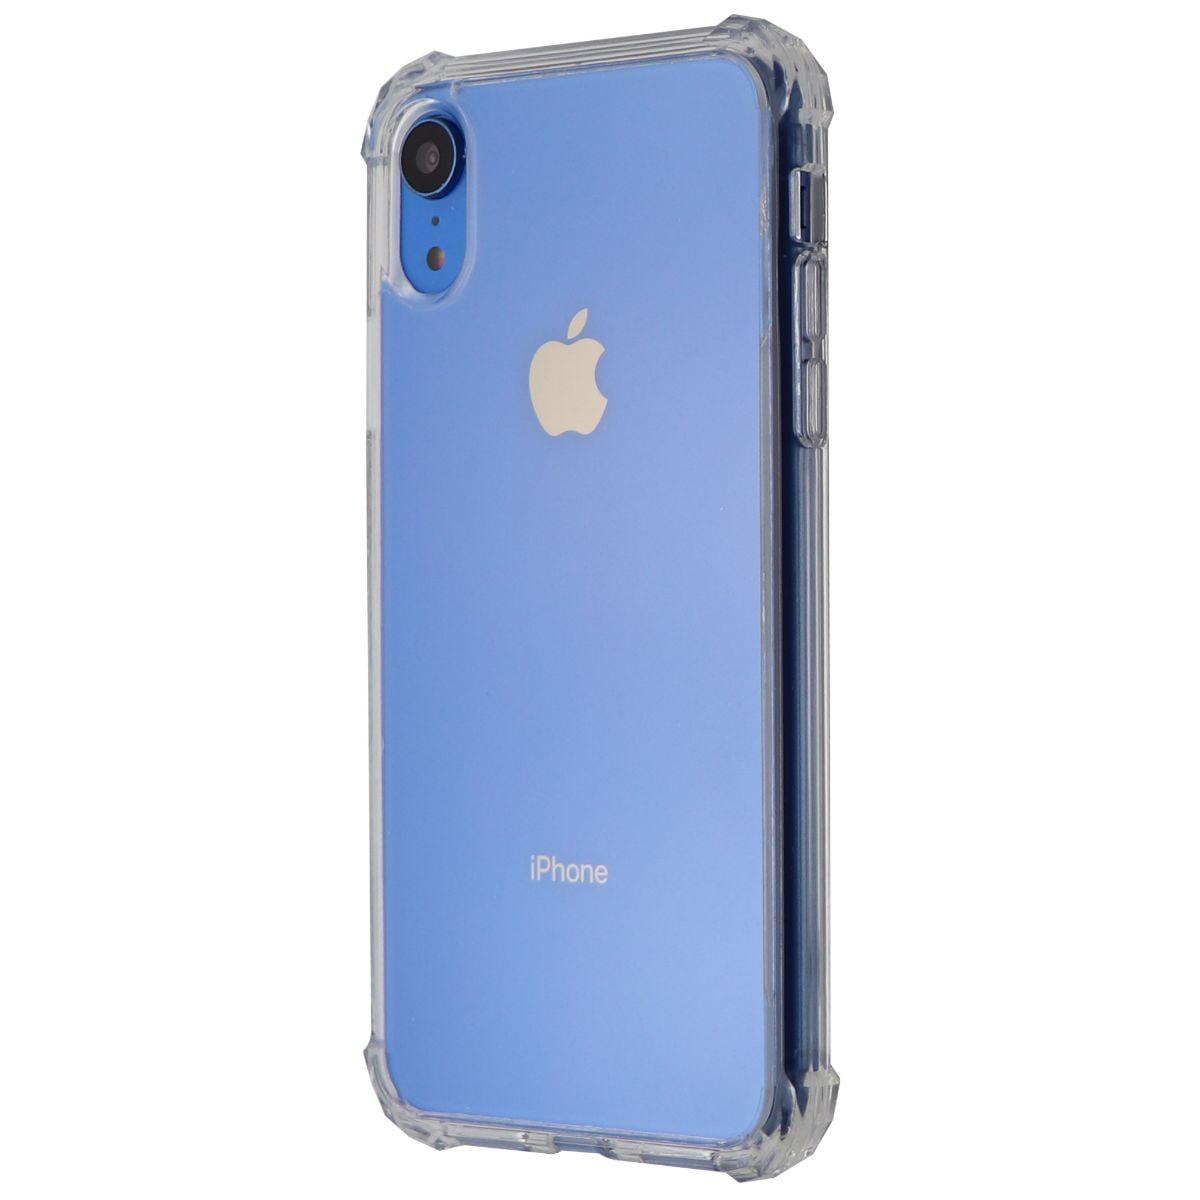 Verizon Wtlpltclcov Clarity Case For Iphone Xr 6 1 Inch Clear Walmart Com Walmart Com